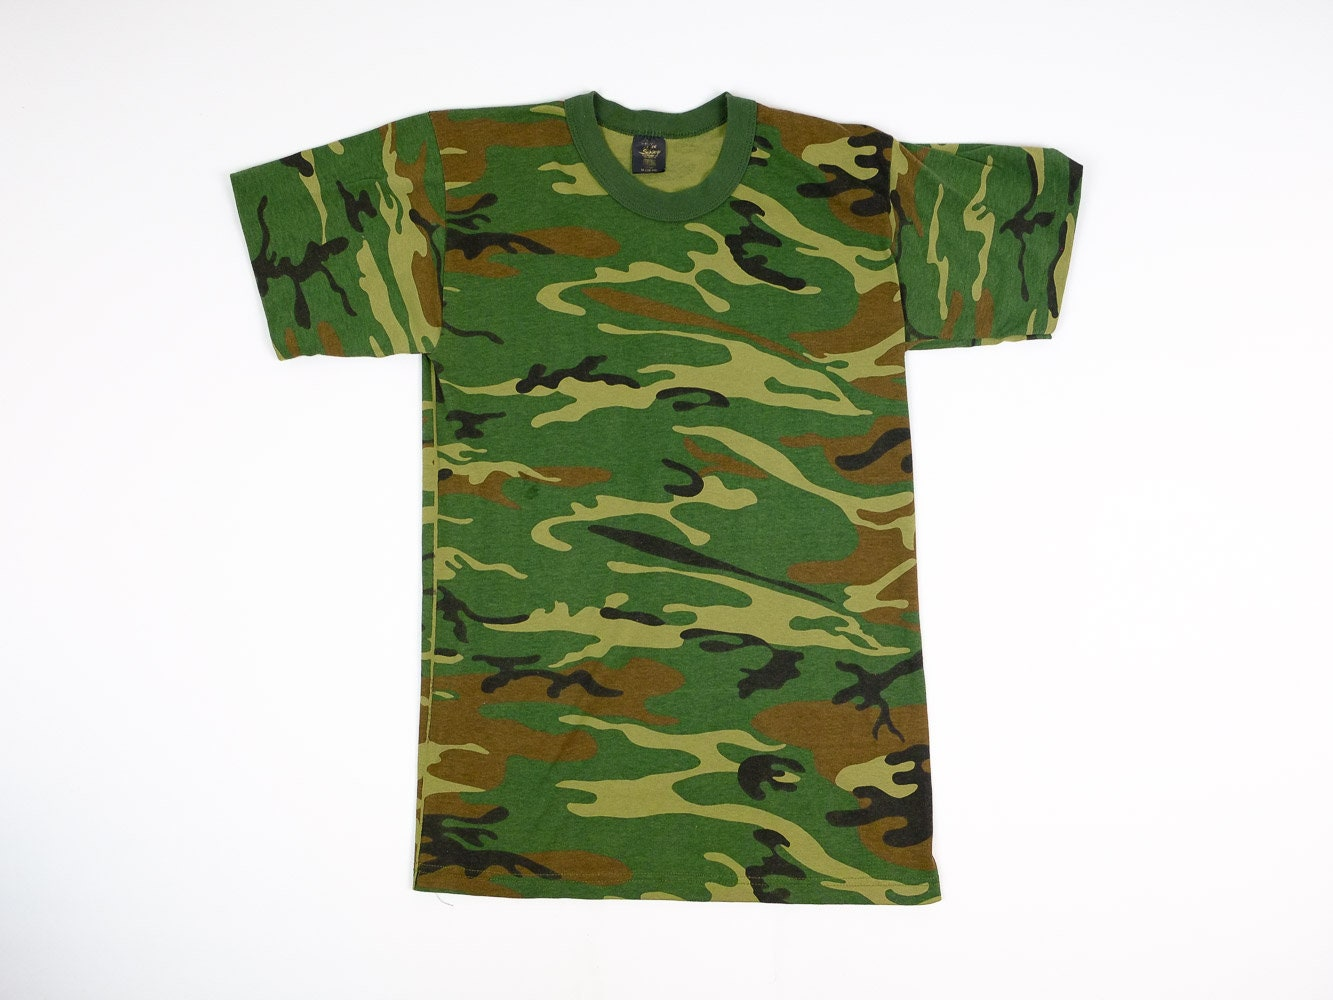 80s Camo Shirt S Vintage Camouflage T-Shirt Men s Small  36448c9454c